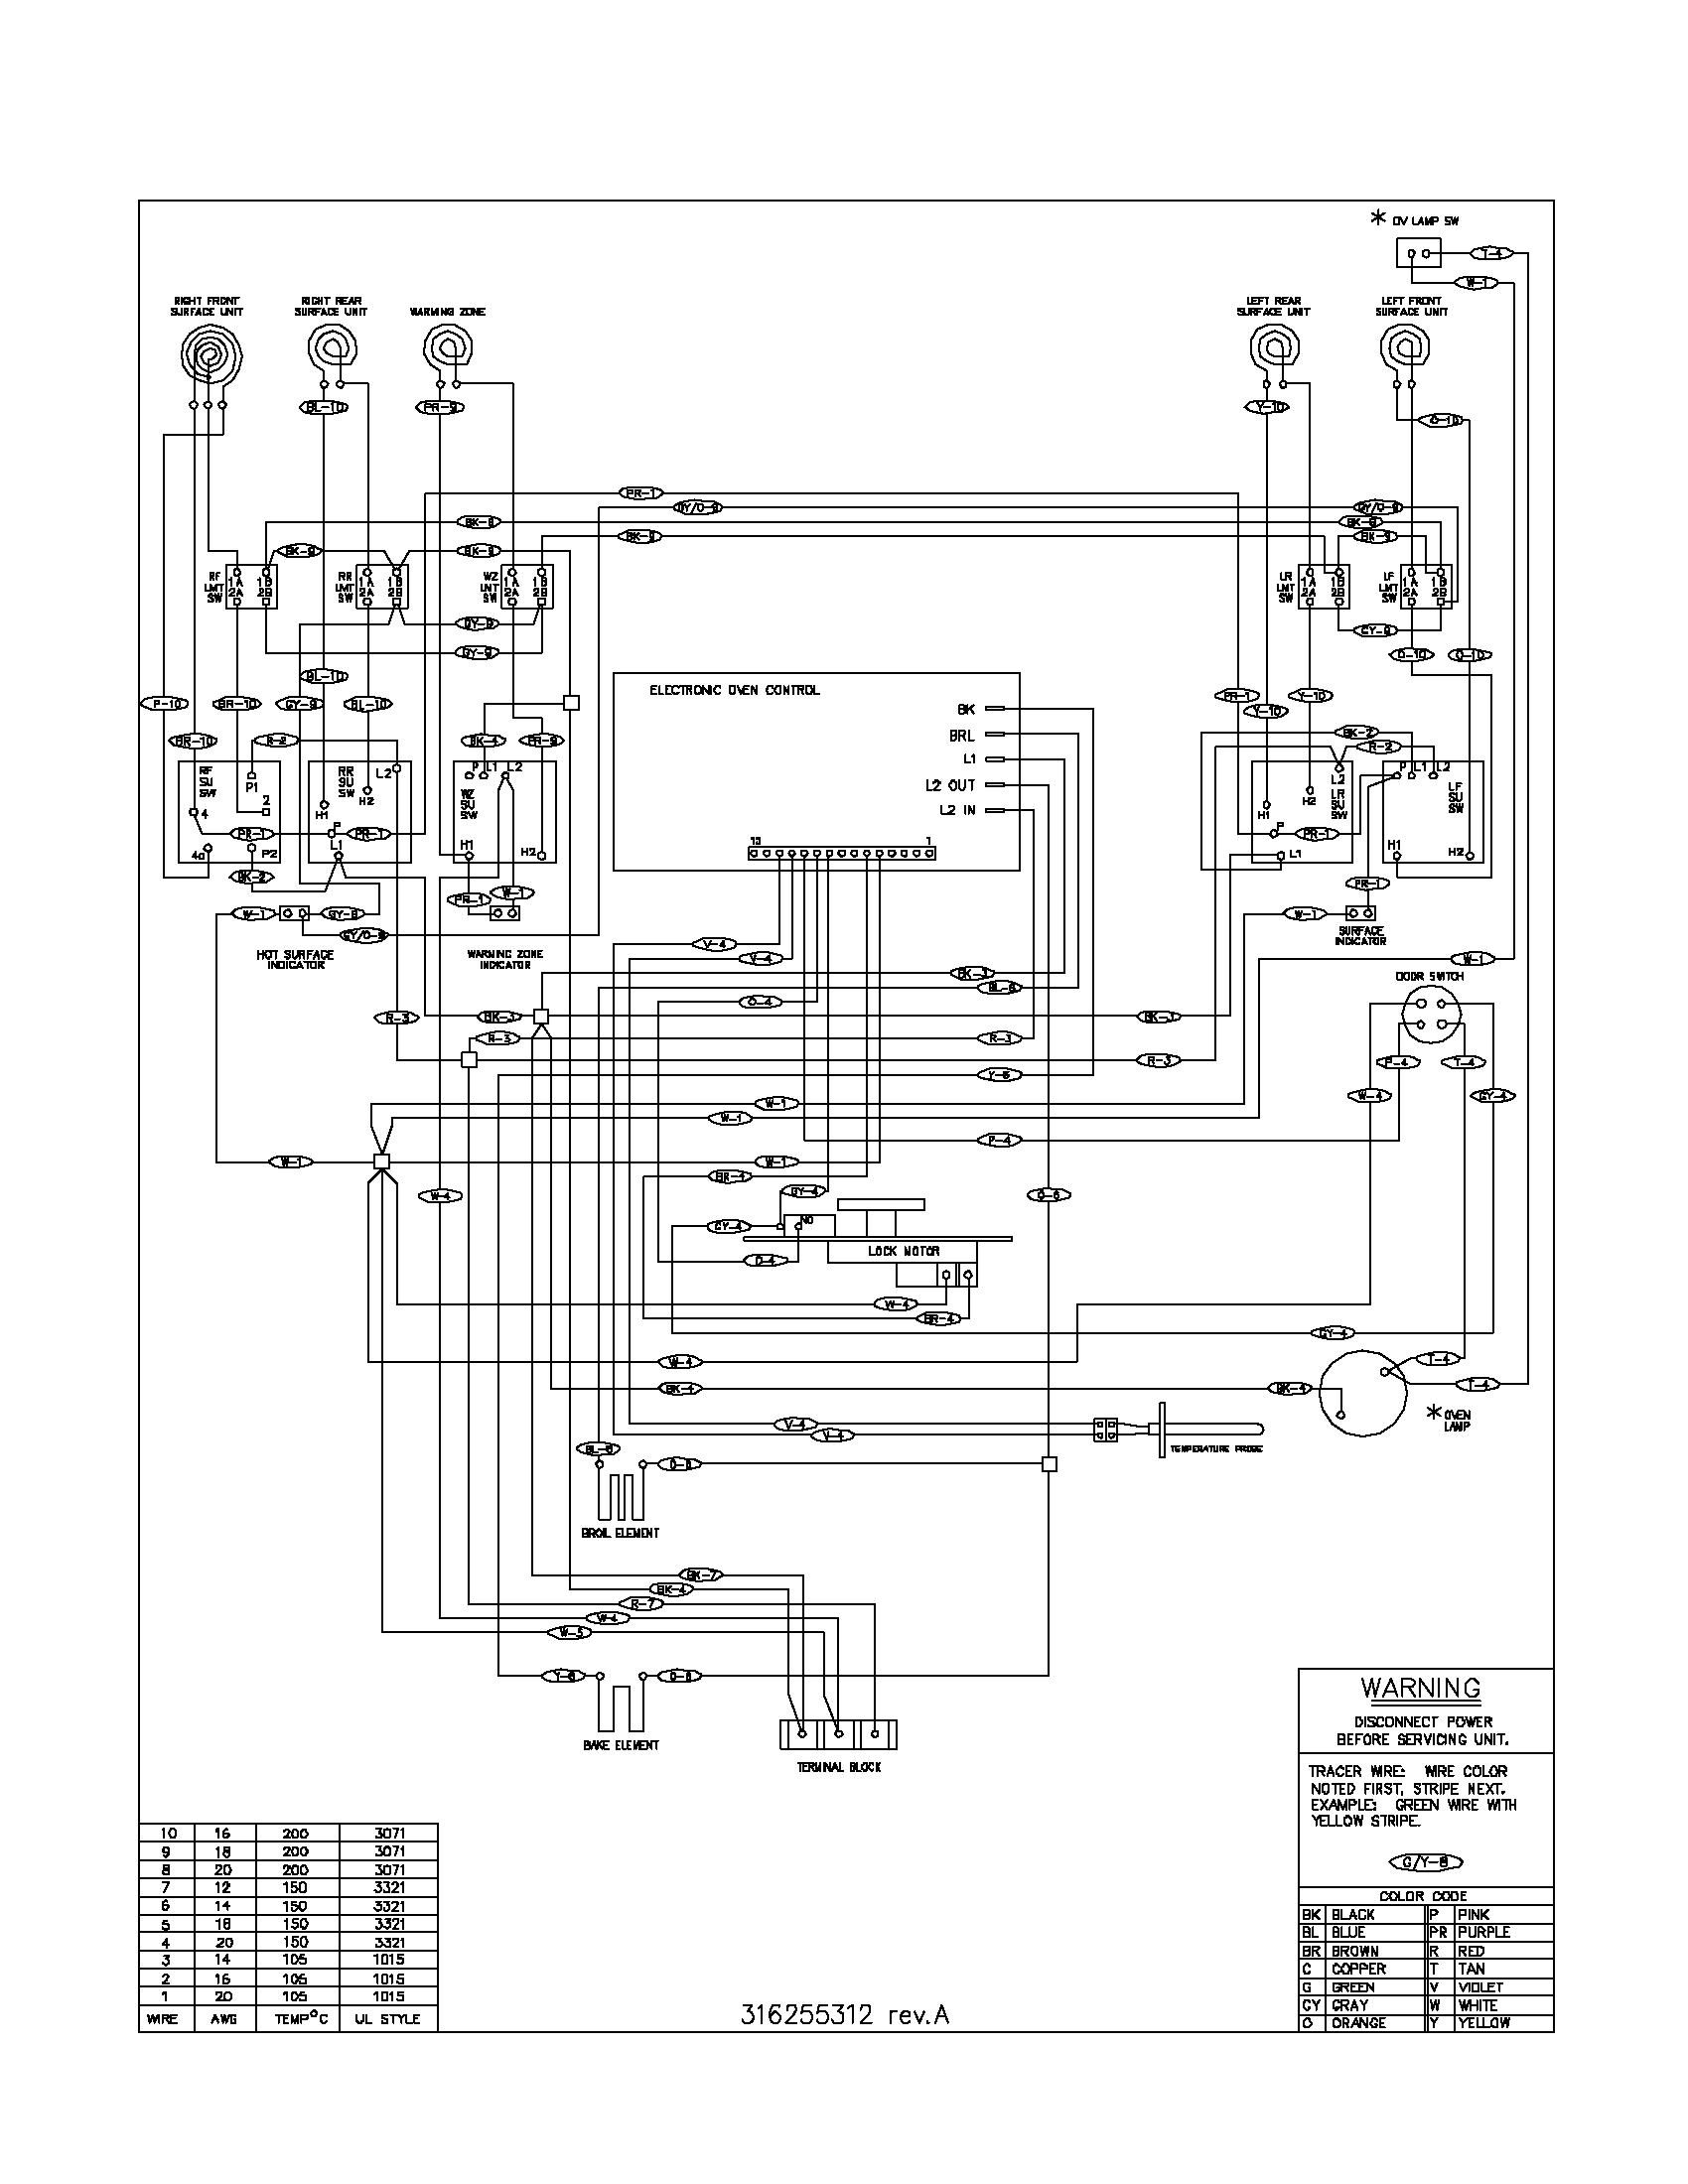 Frigidaire Oven Wiring Diagram - Clear Alternatives Wiring Diagram -  pontiacs.lalu.decorresine.itWiring Diagram Resource